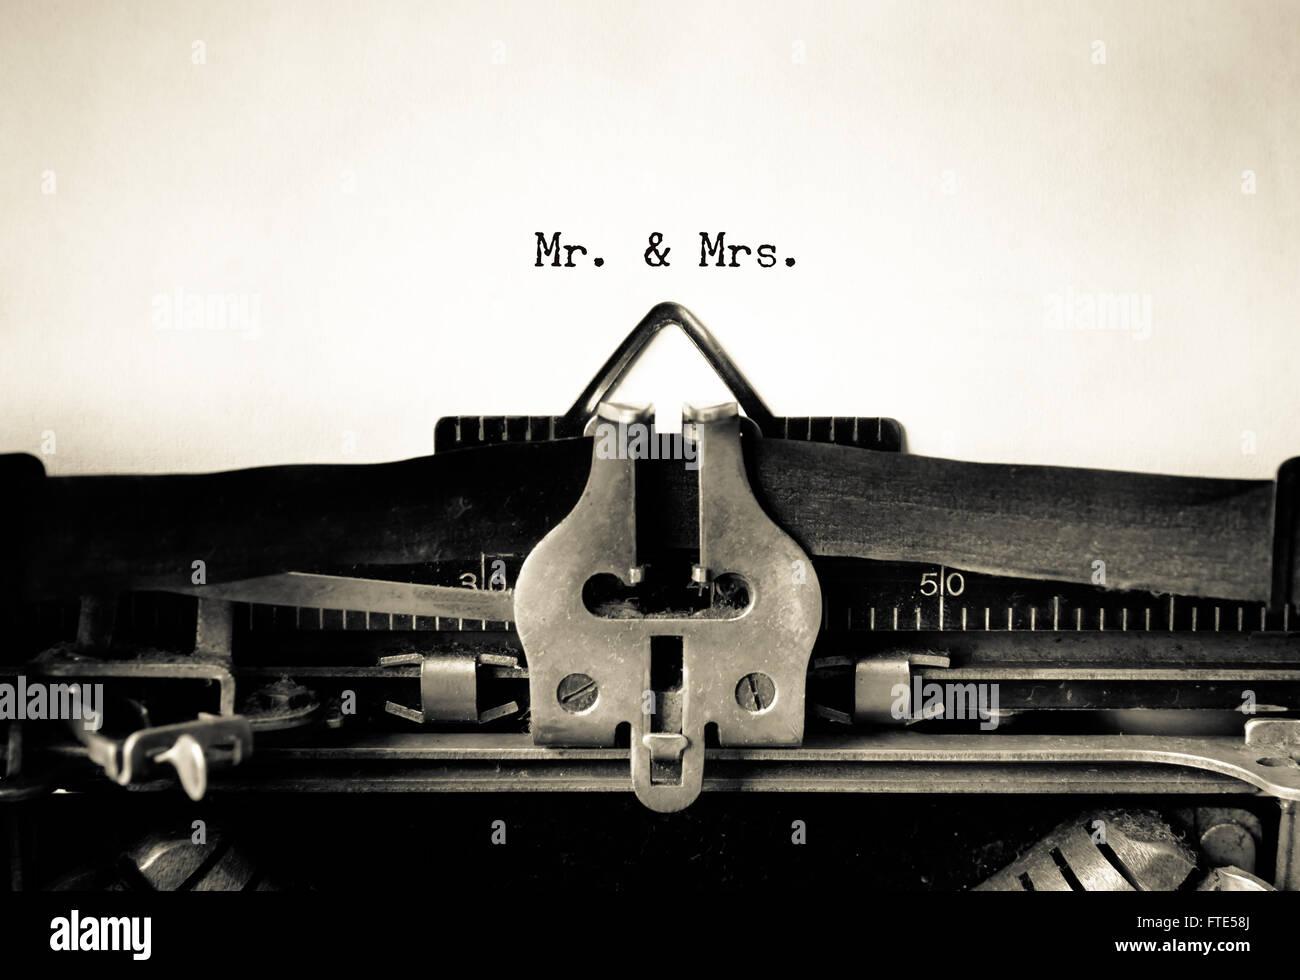 Mr & Mrs parole digitate su una macchina da scrivere vintage Immagini Stock